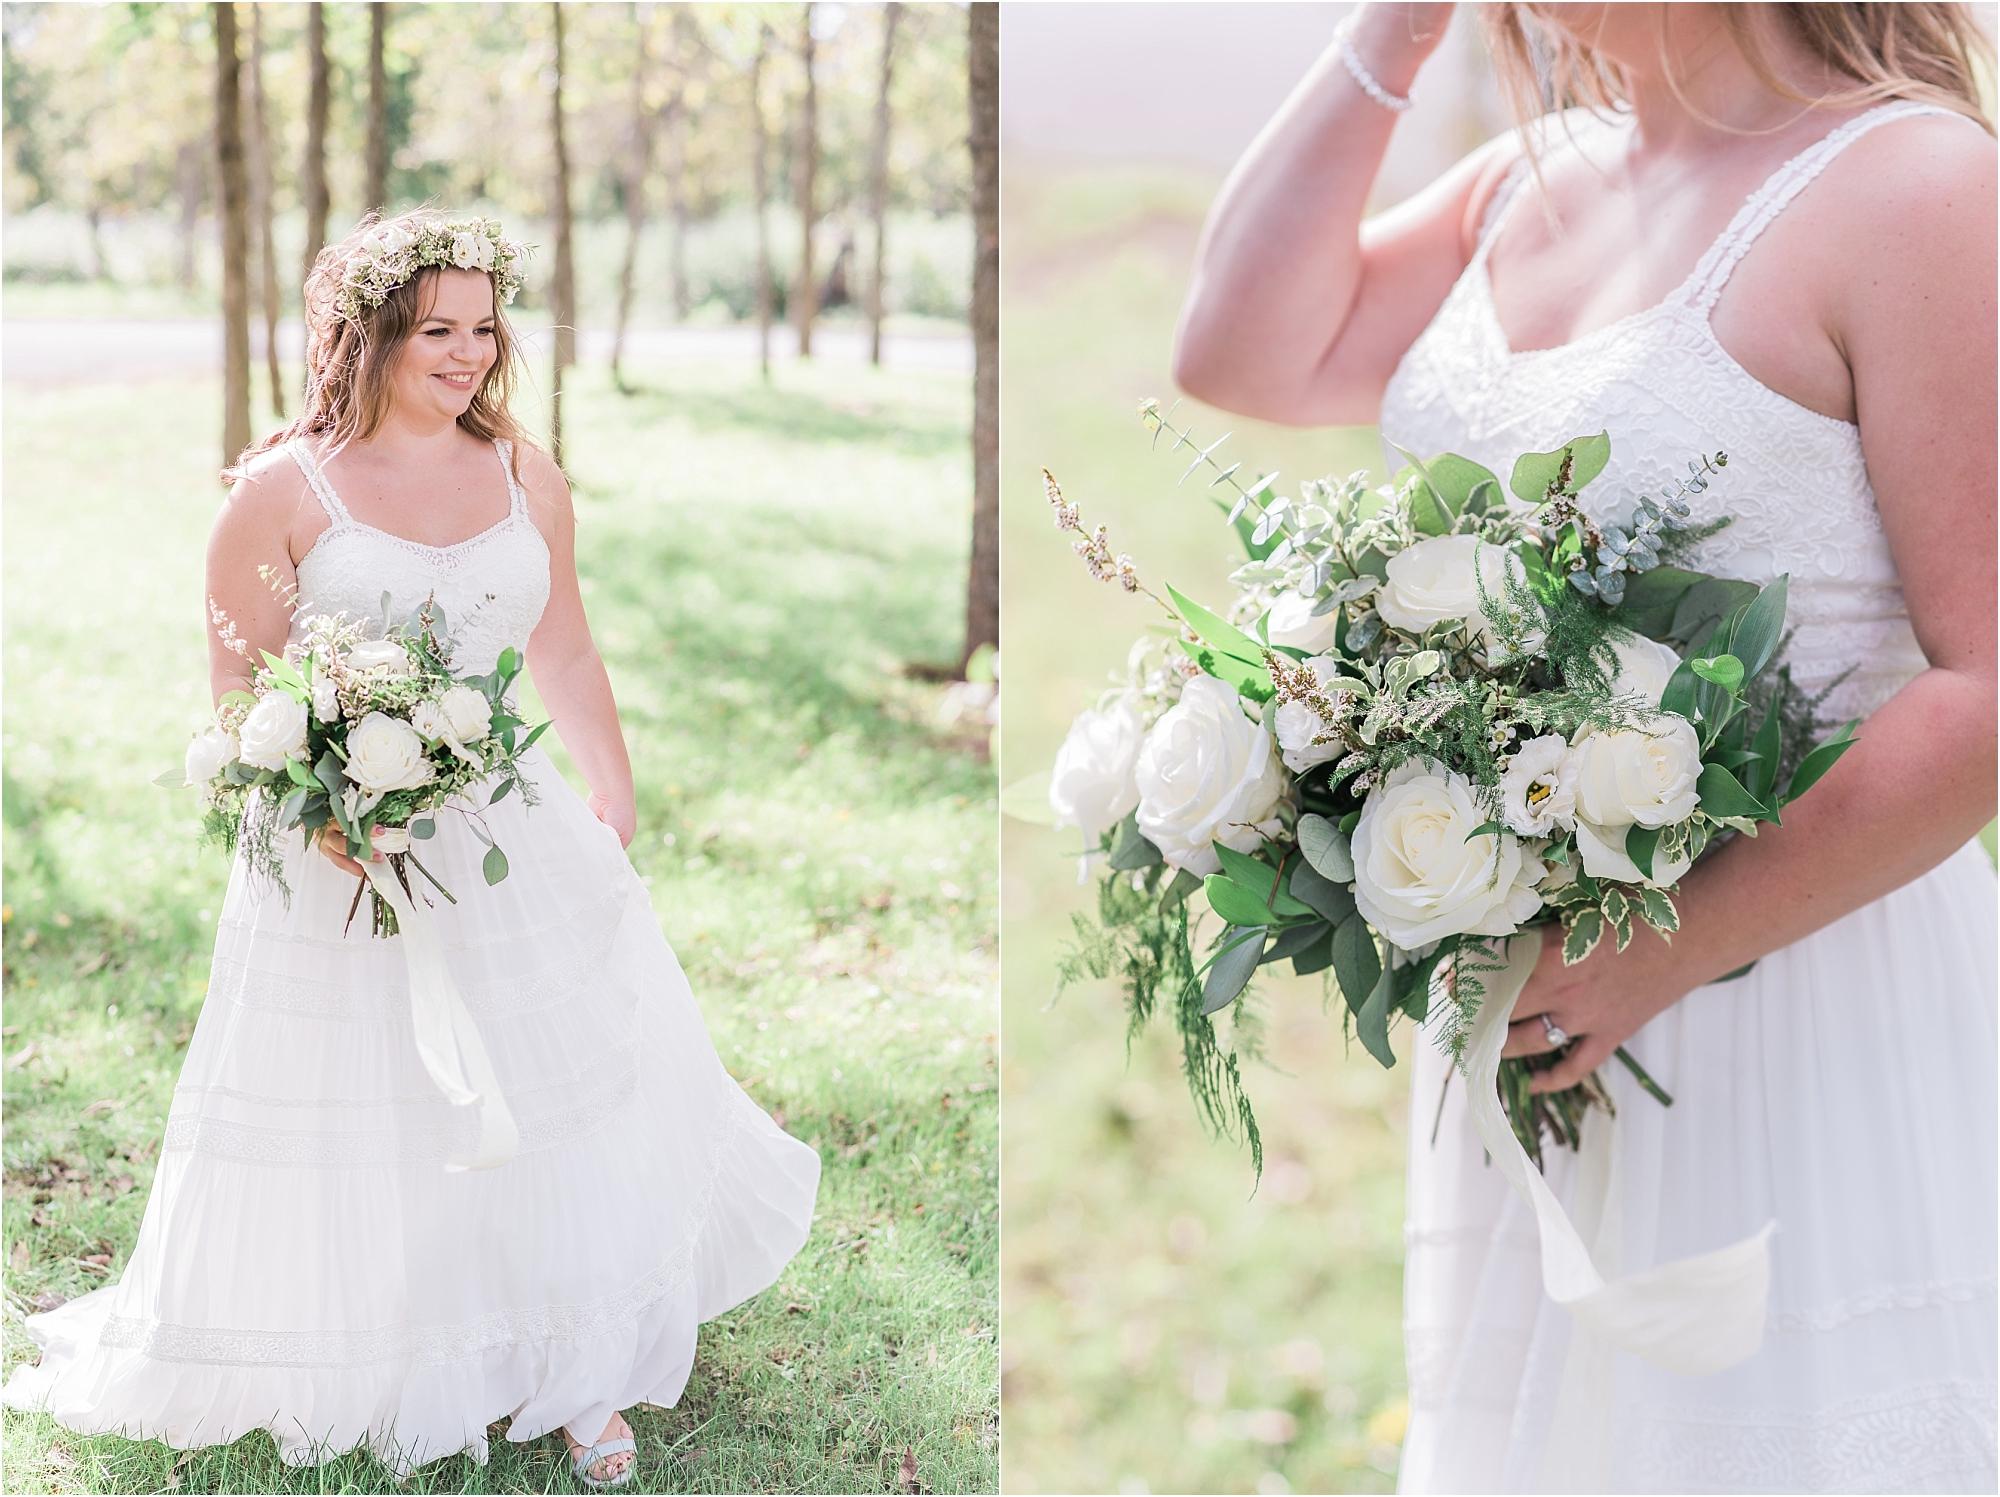 0048 Summer Stonefields Wedding Carleton Place - Ottawa Wedding - Photography by Emma_WEB.jpg